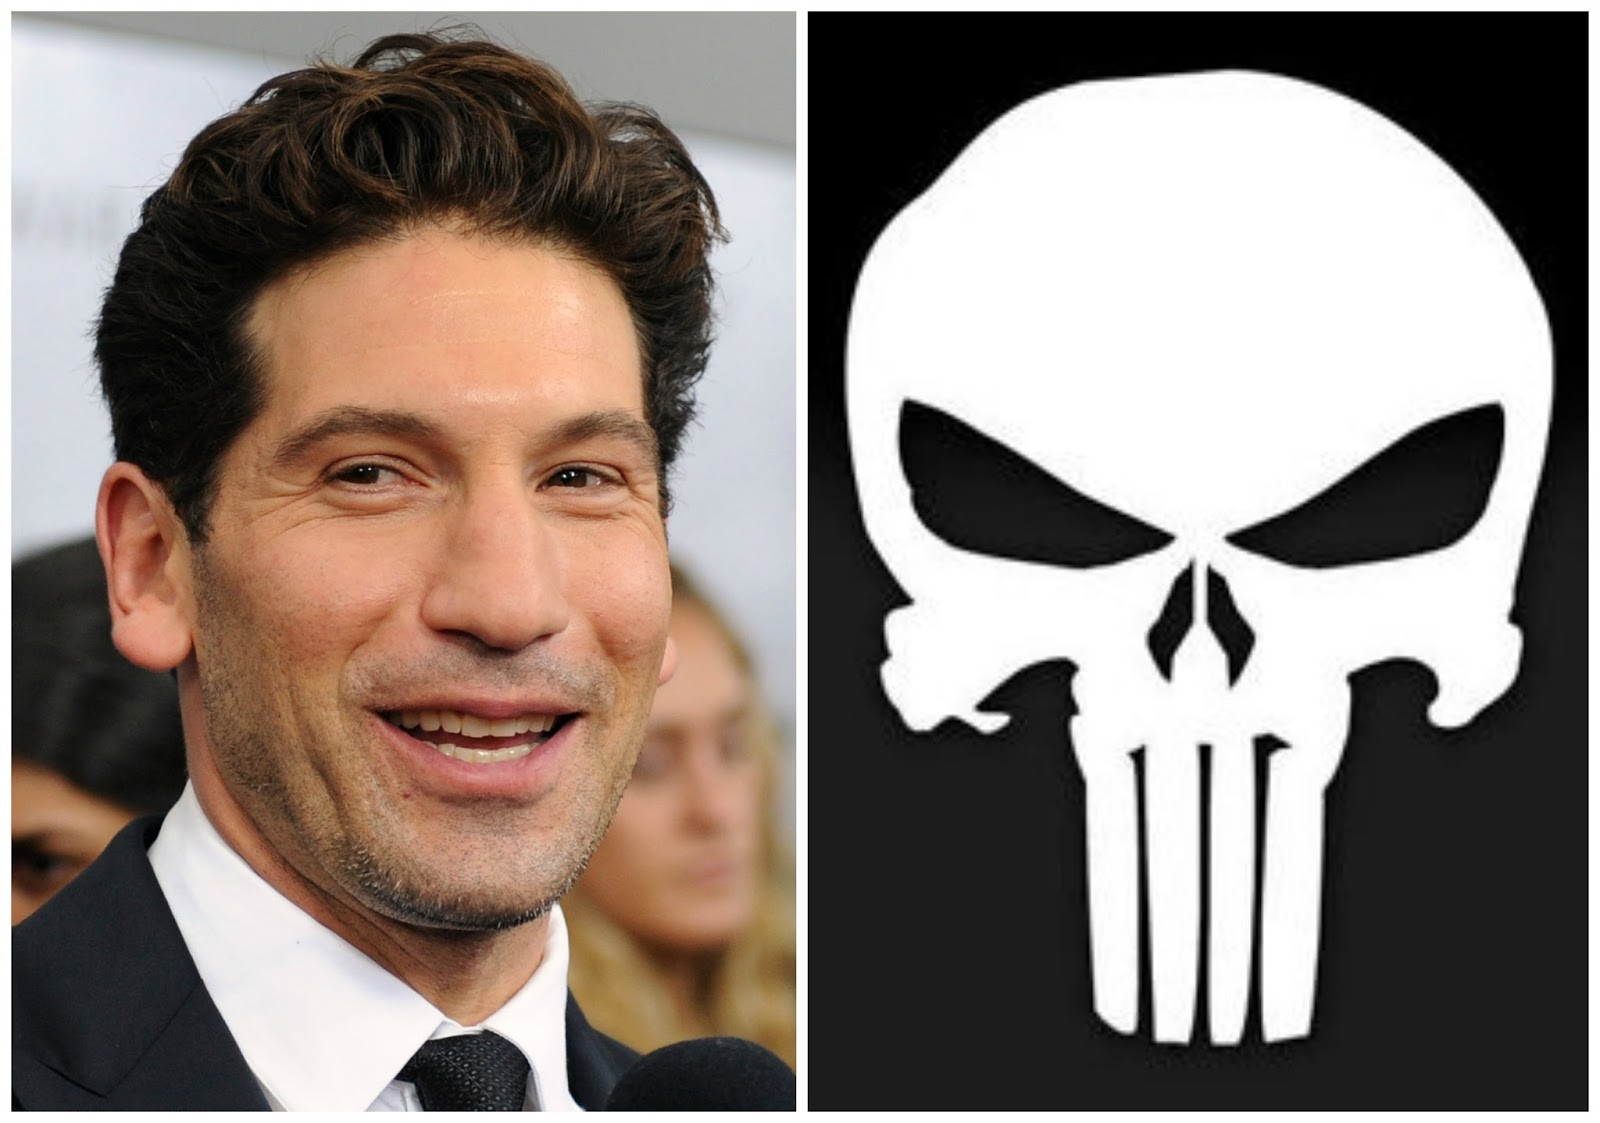 Jon Bernthal Cast as The Punisher in <i>Daredevil</i> Season 2